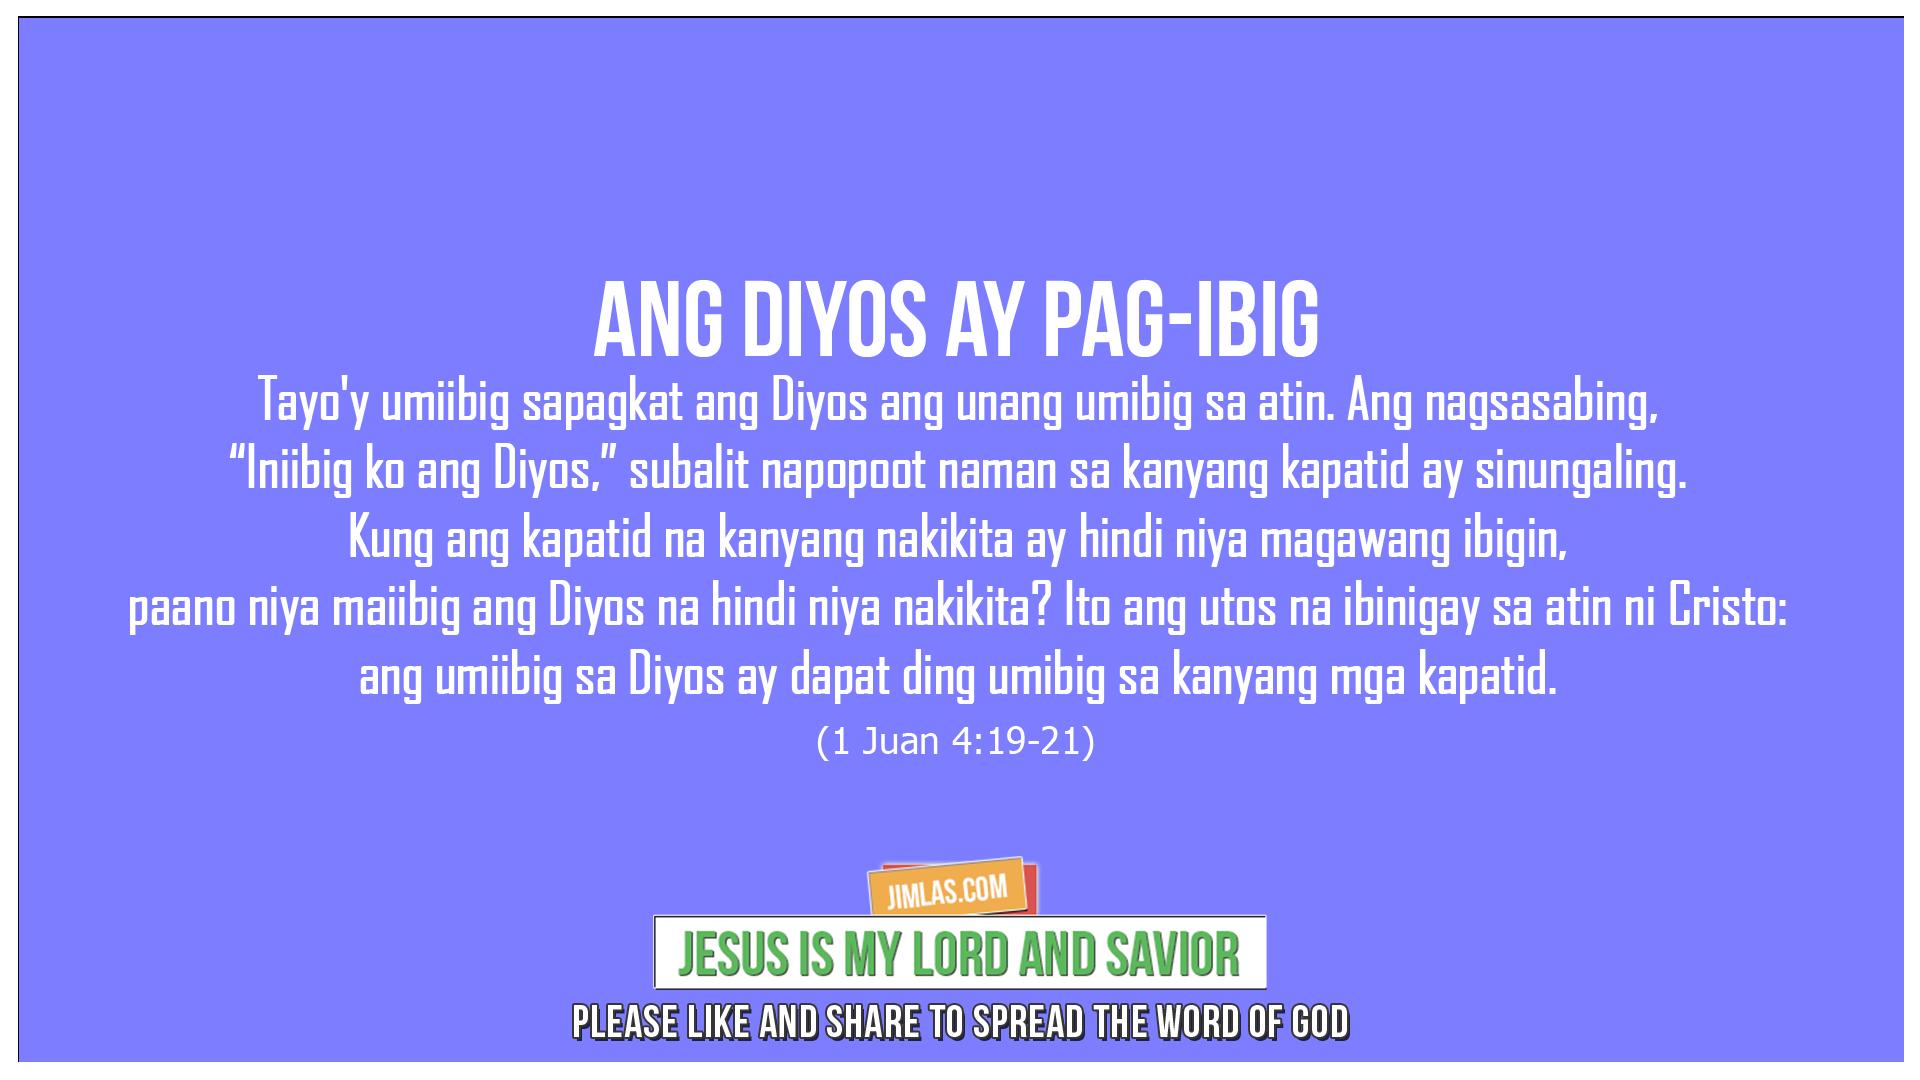 1 Juan 4:19-21, 1 Juan 4:19-21